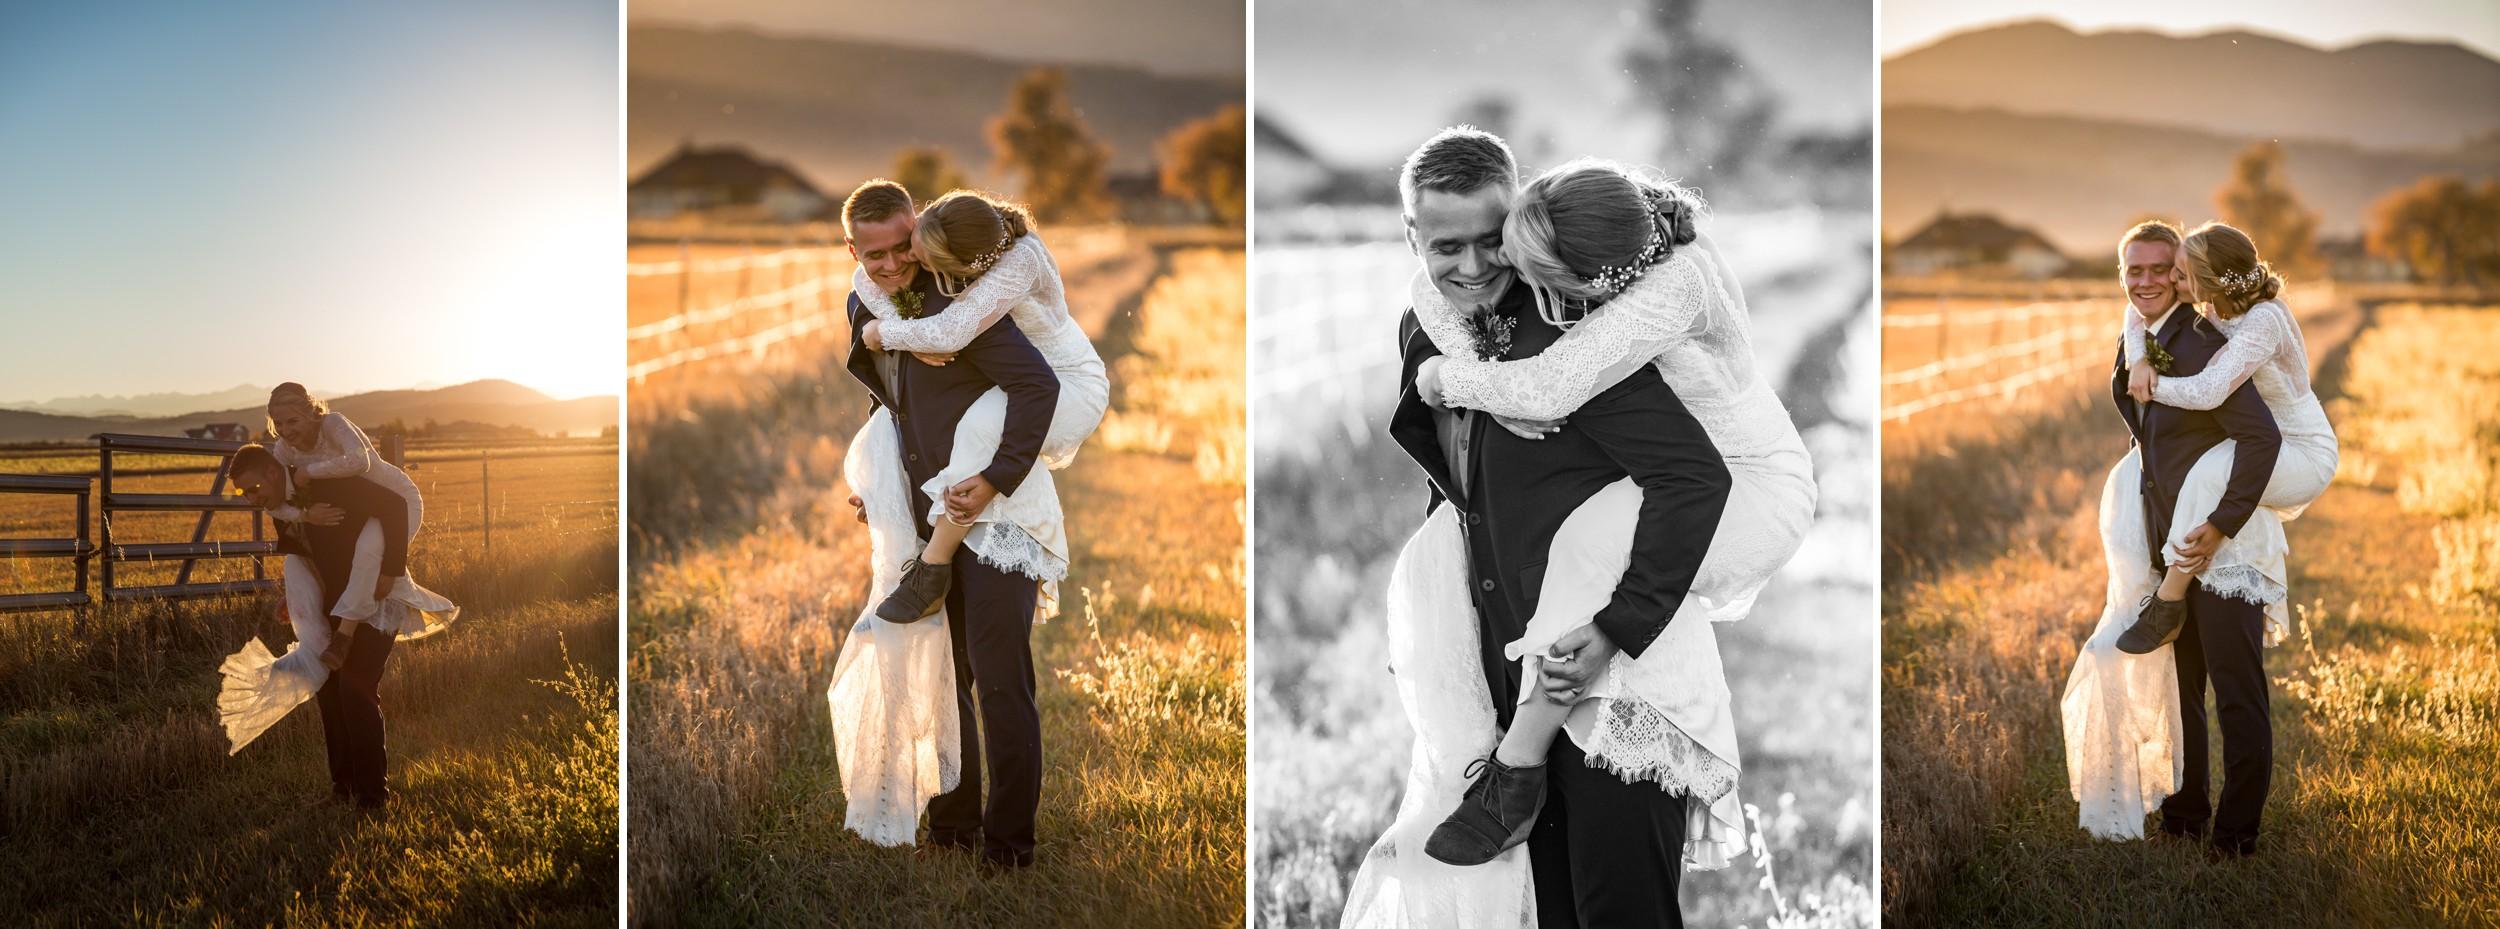 Loveland, CO Wedding Photographer